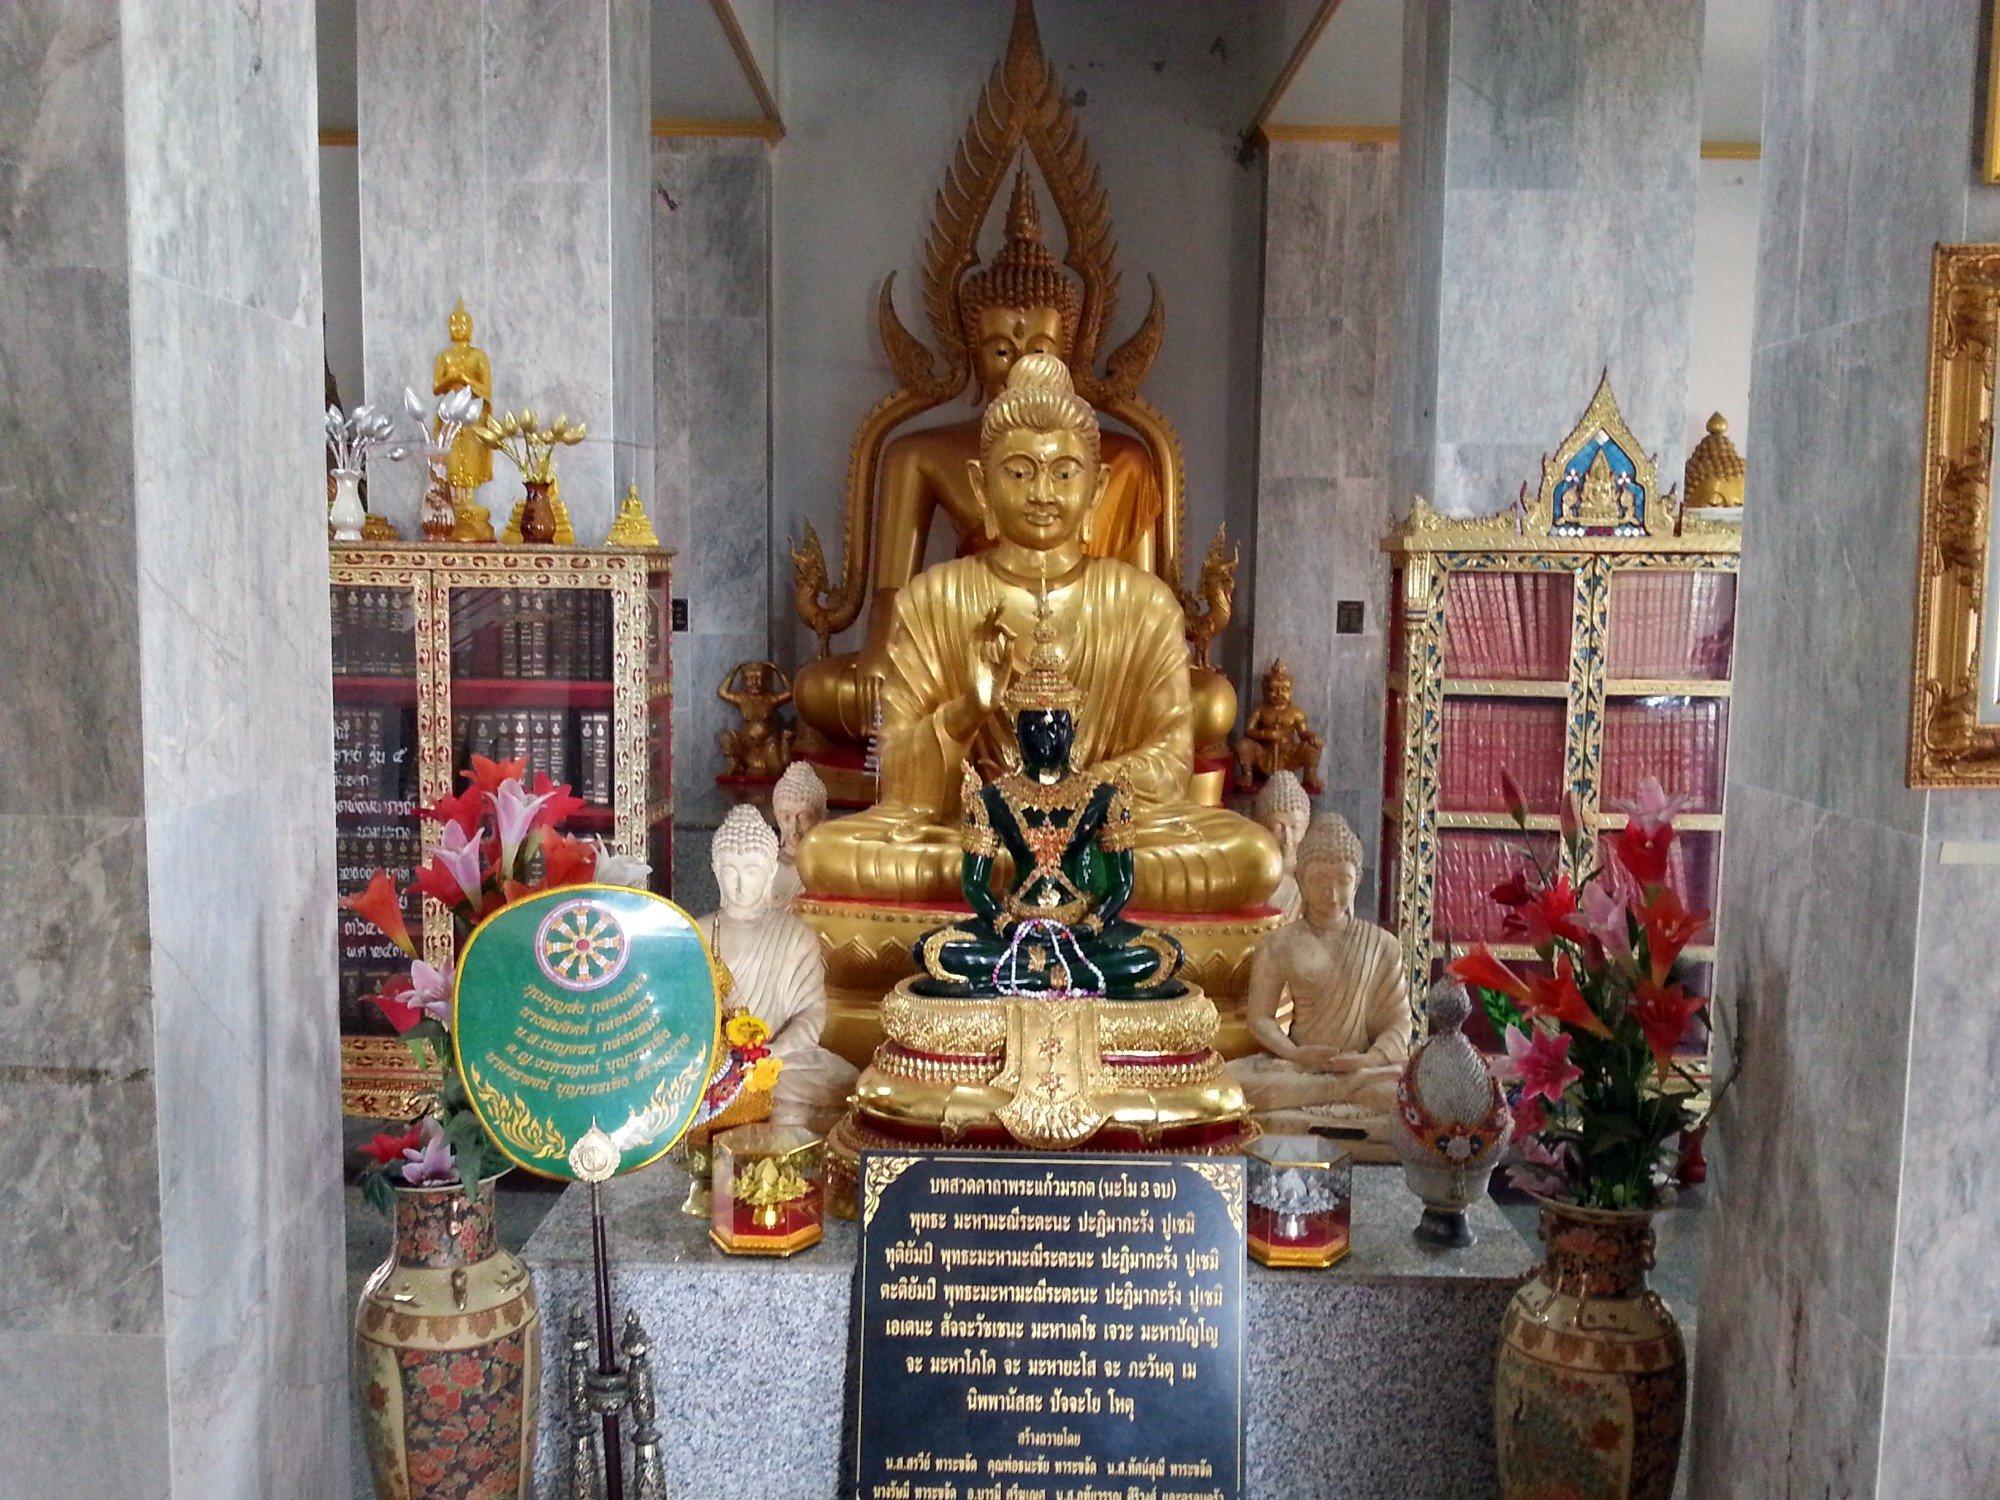 Replica Buddha statues at the Phra Chulamanee Chedi